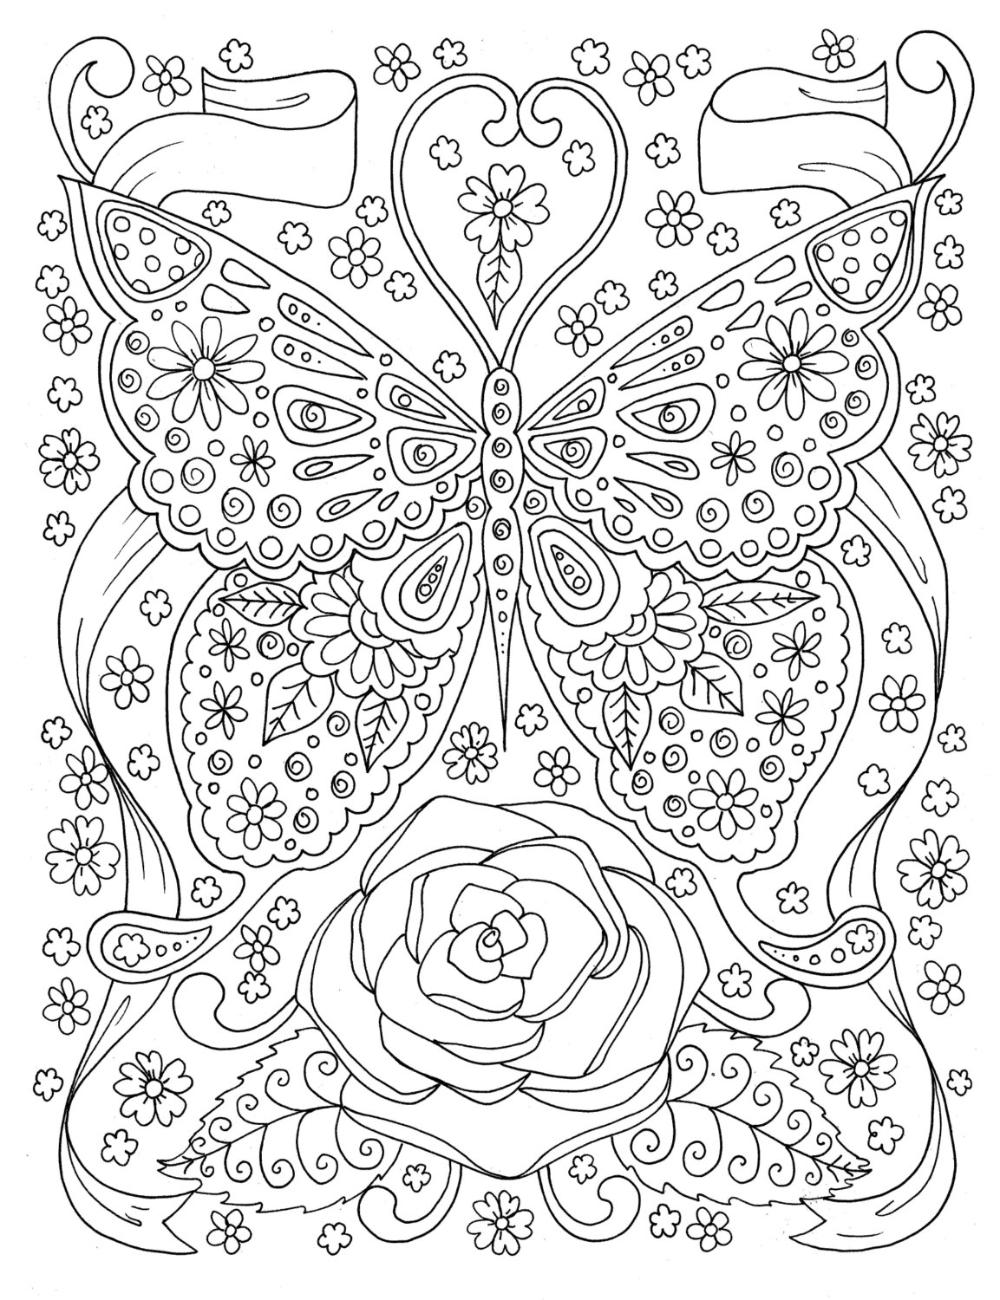 Pin On Coloring Pages Deborah Muller [ 1300 x 1000 Pixel ]